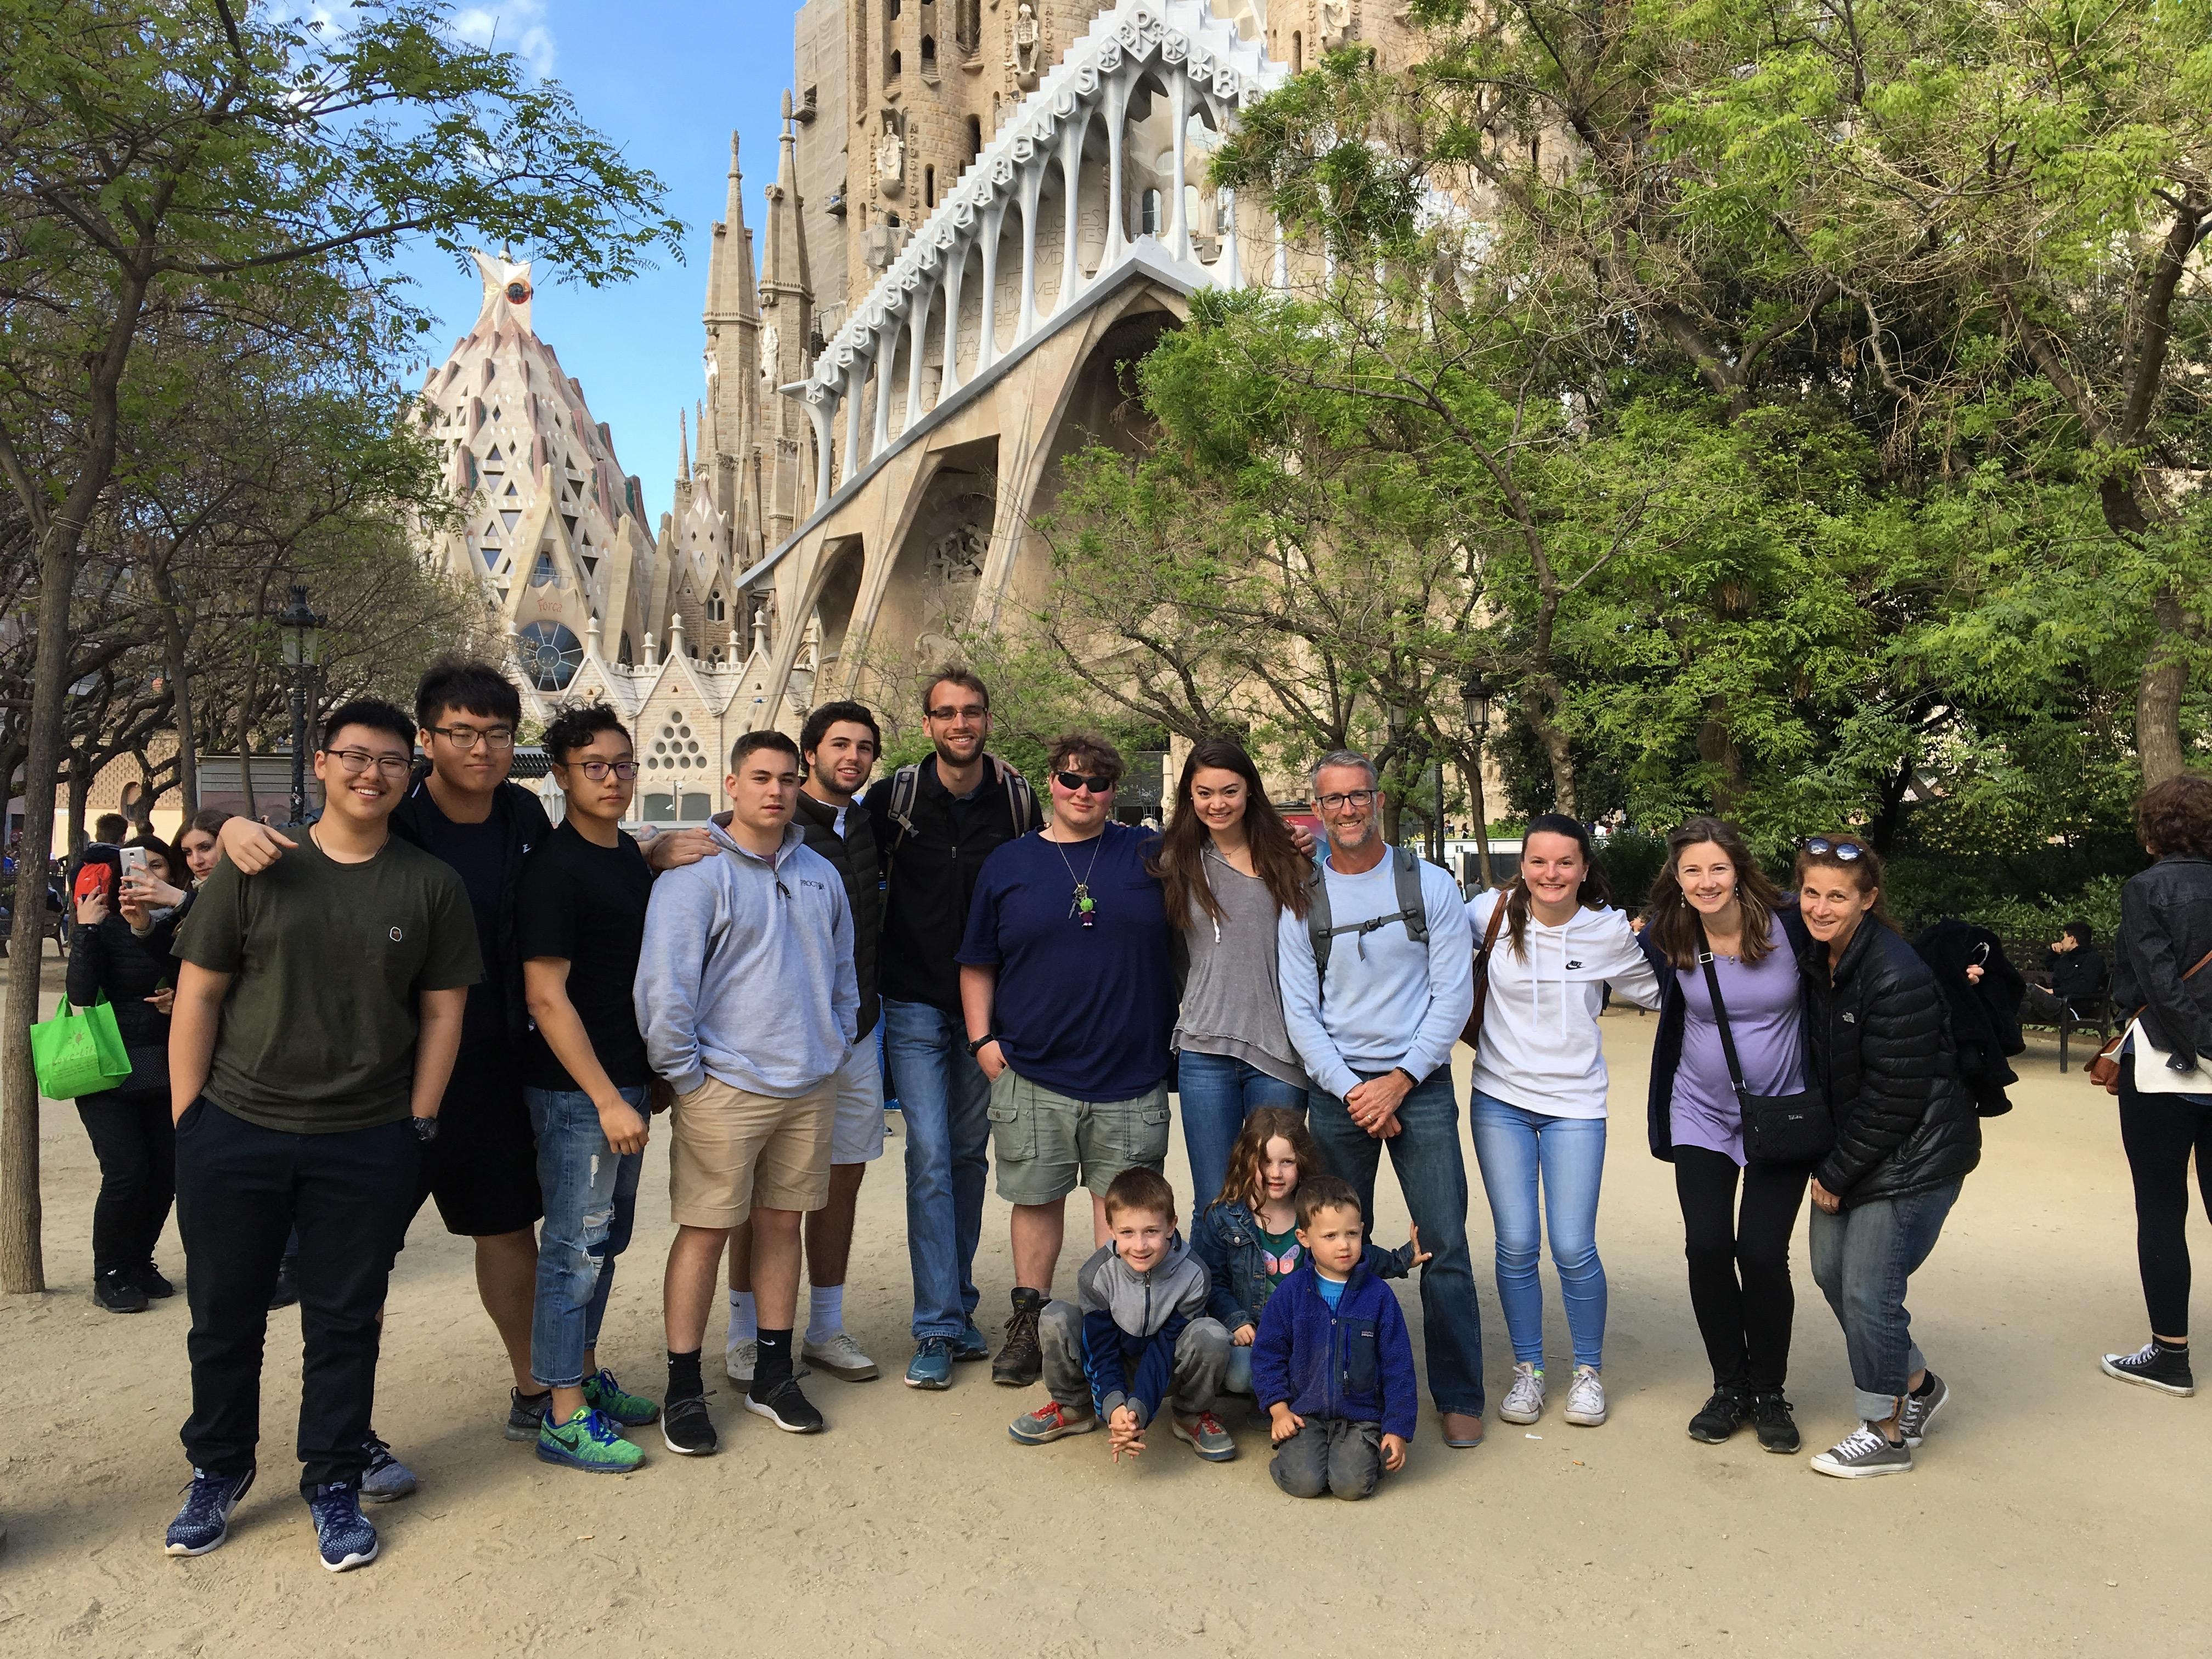 Proctor en Segovia visit's Gaudí's Sagrada Familia